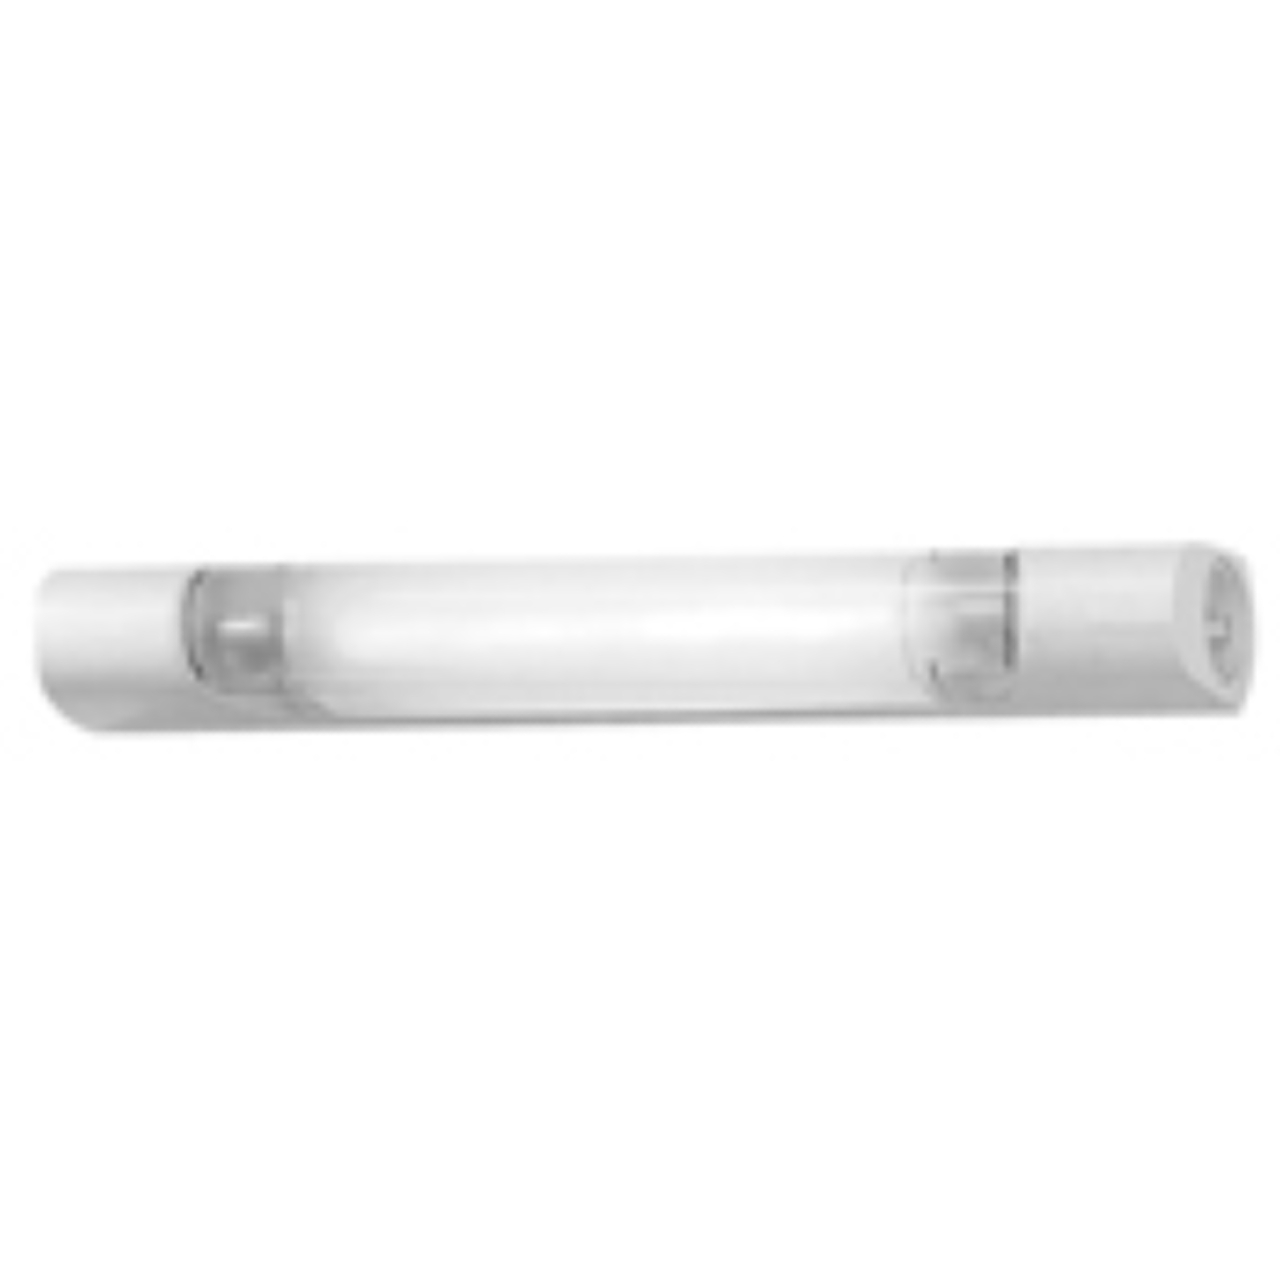 applique fluo prismaline s19 ip24 avec prise rasoir. Black Bedroom Furniture Sets. Home Design Ideas